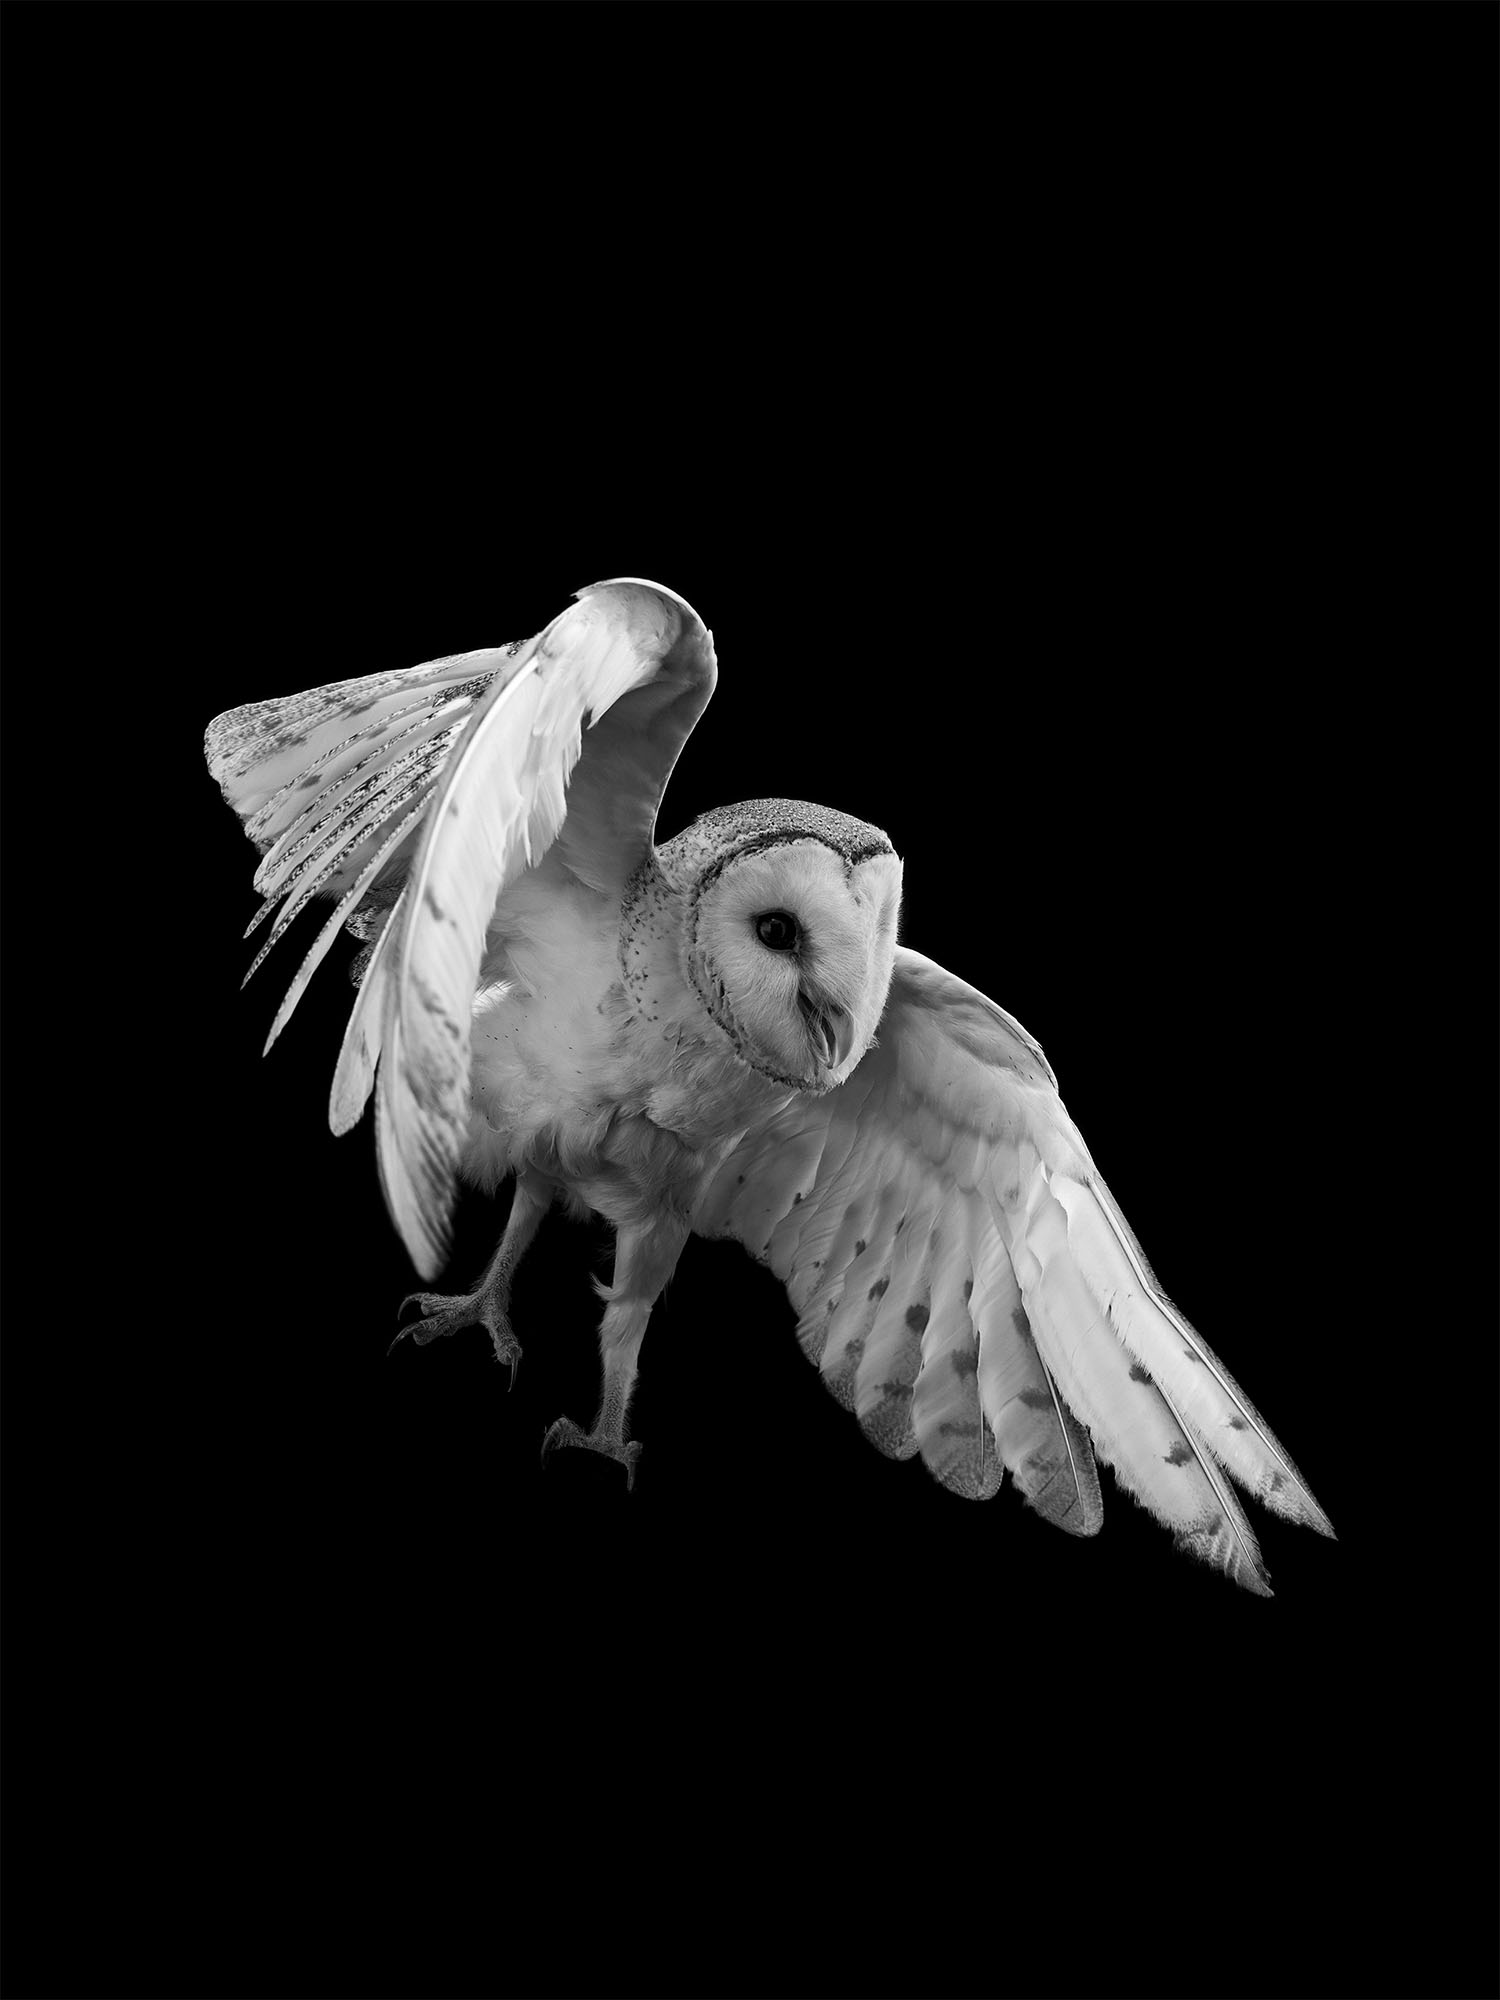 barn-owl-gary-heery-bird-print.jpg